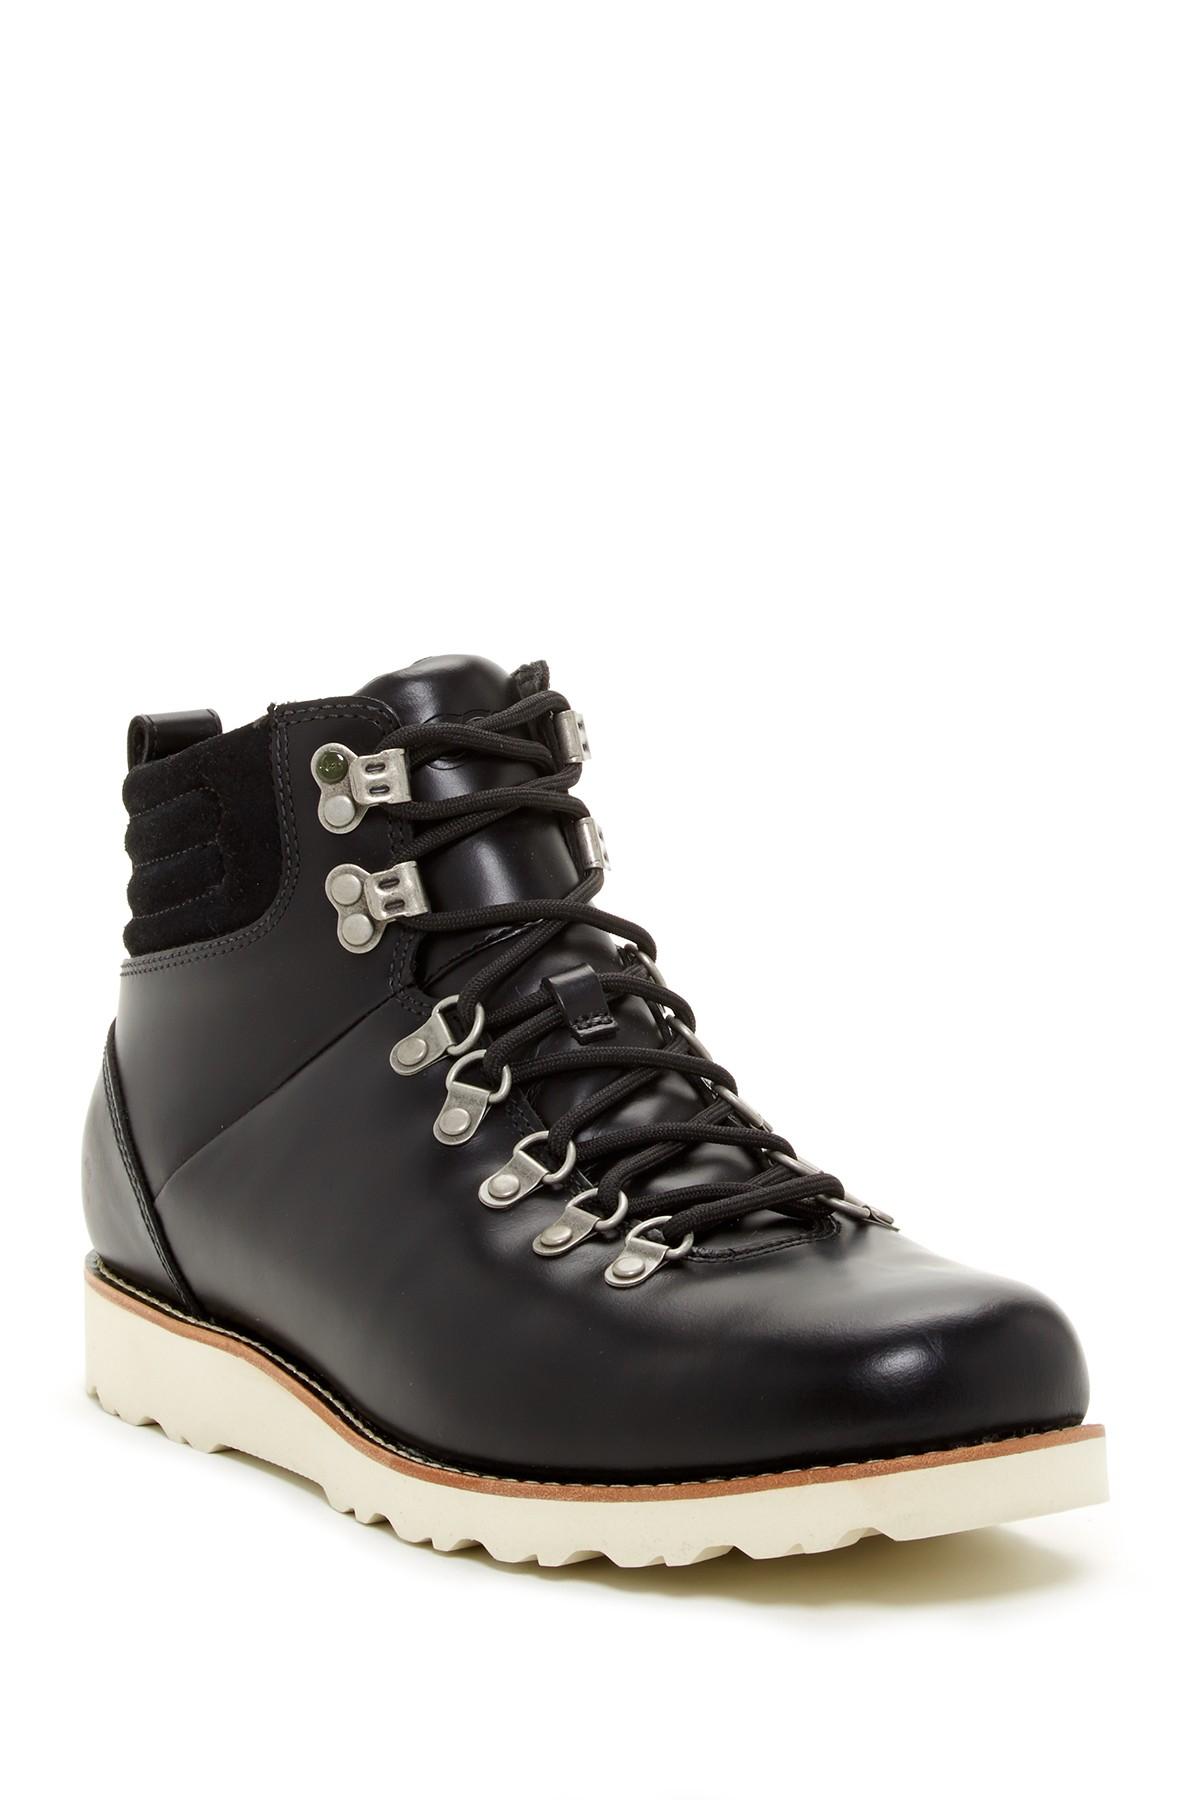 ugg capulin waterproof boot in black for lyst